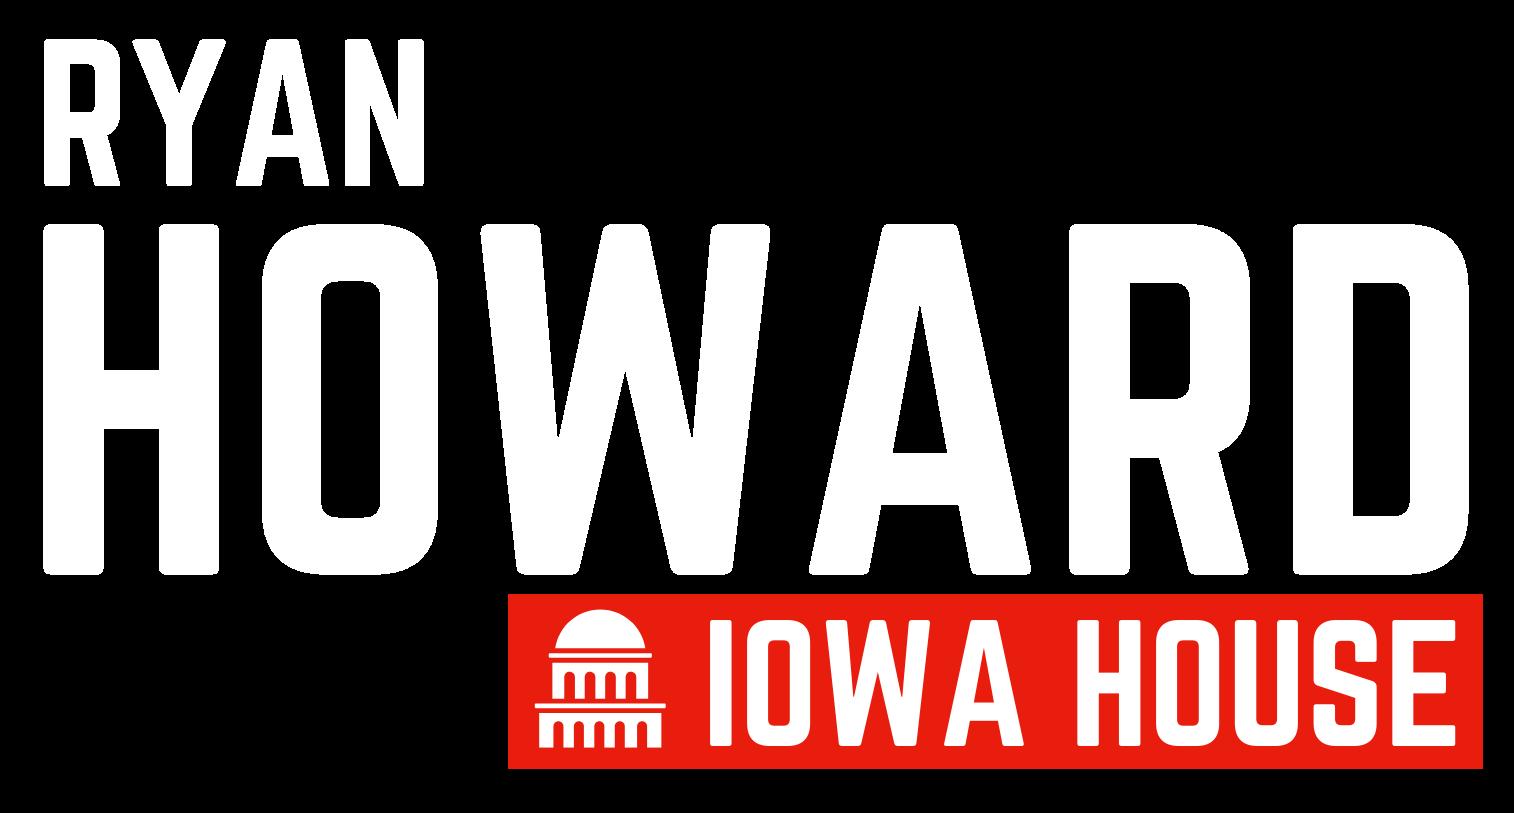 Ryan Howard for Iowa